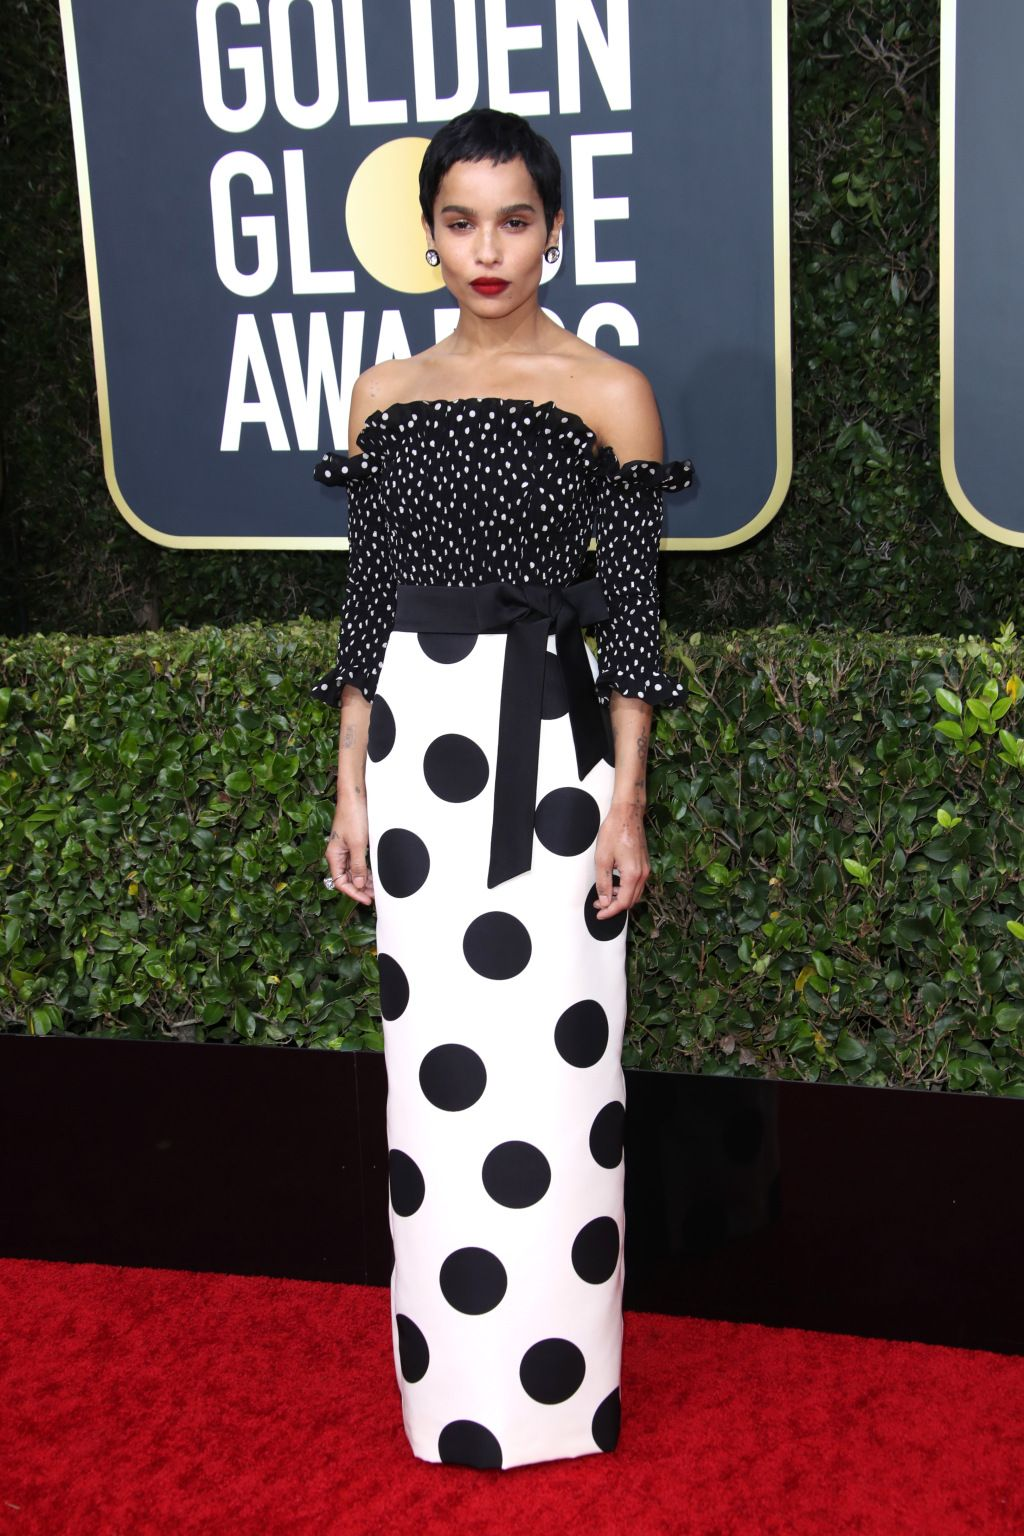 Zoe Kravitz Leads the 2020 Golden Globes Best Dressed List